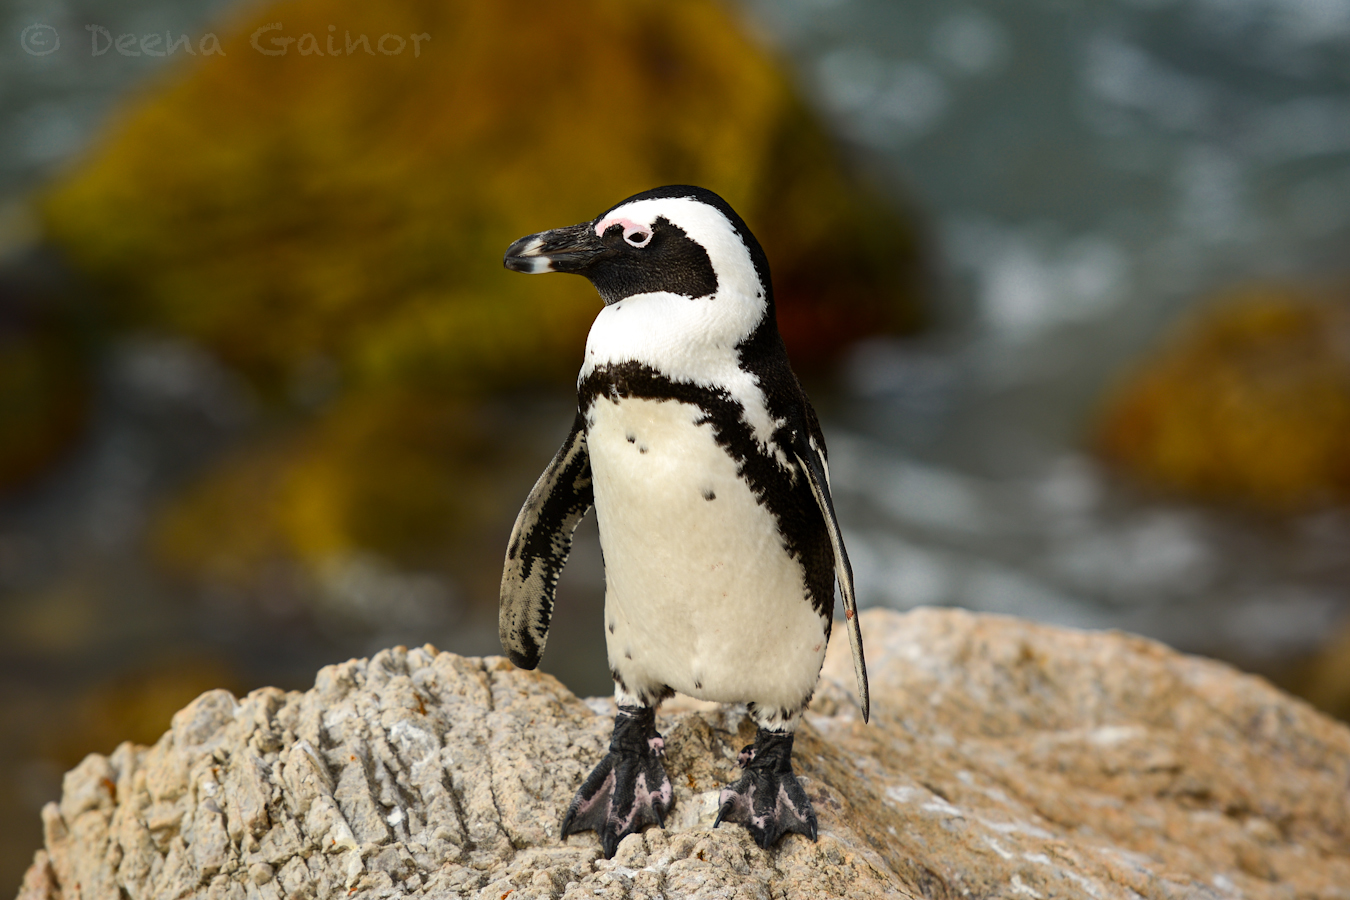 RTW South Africa Penguins 4 wm.jpg